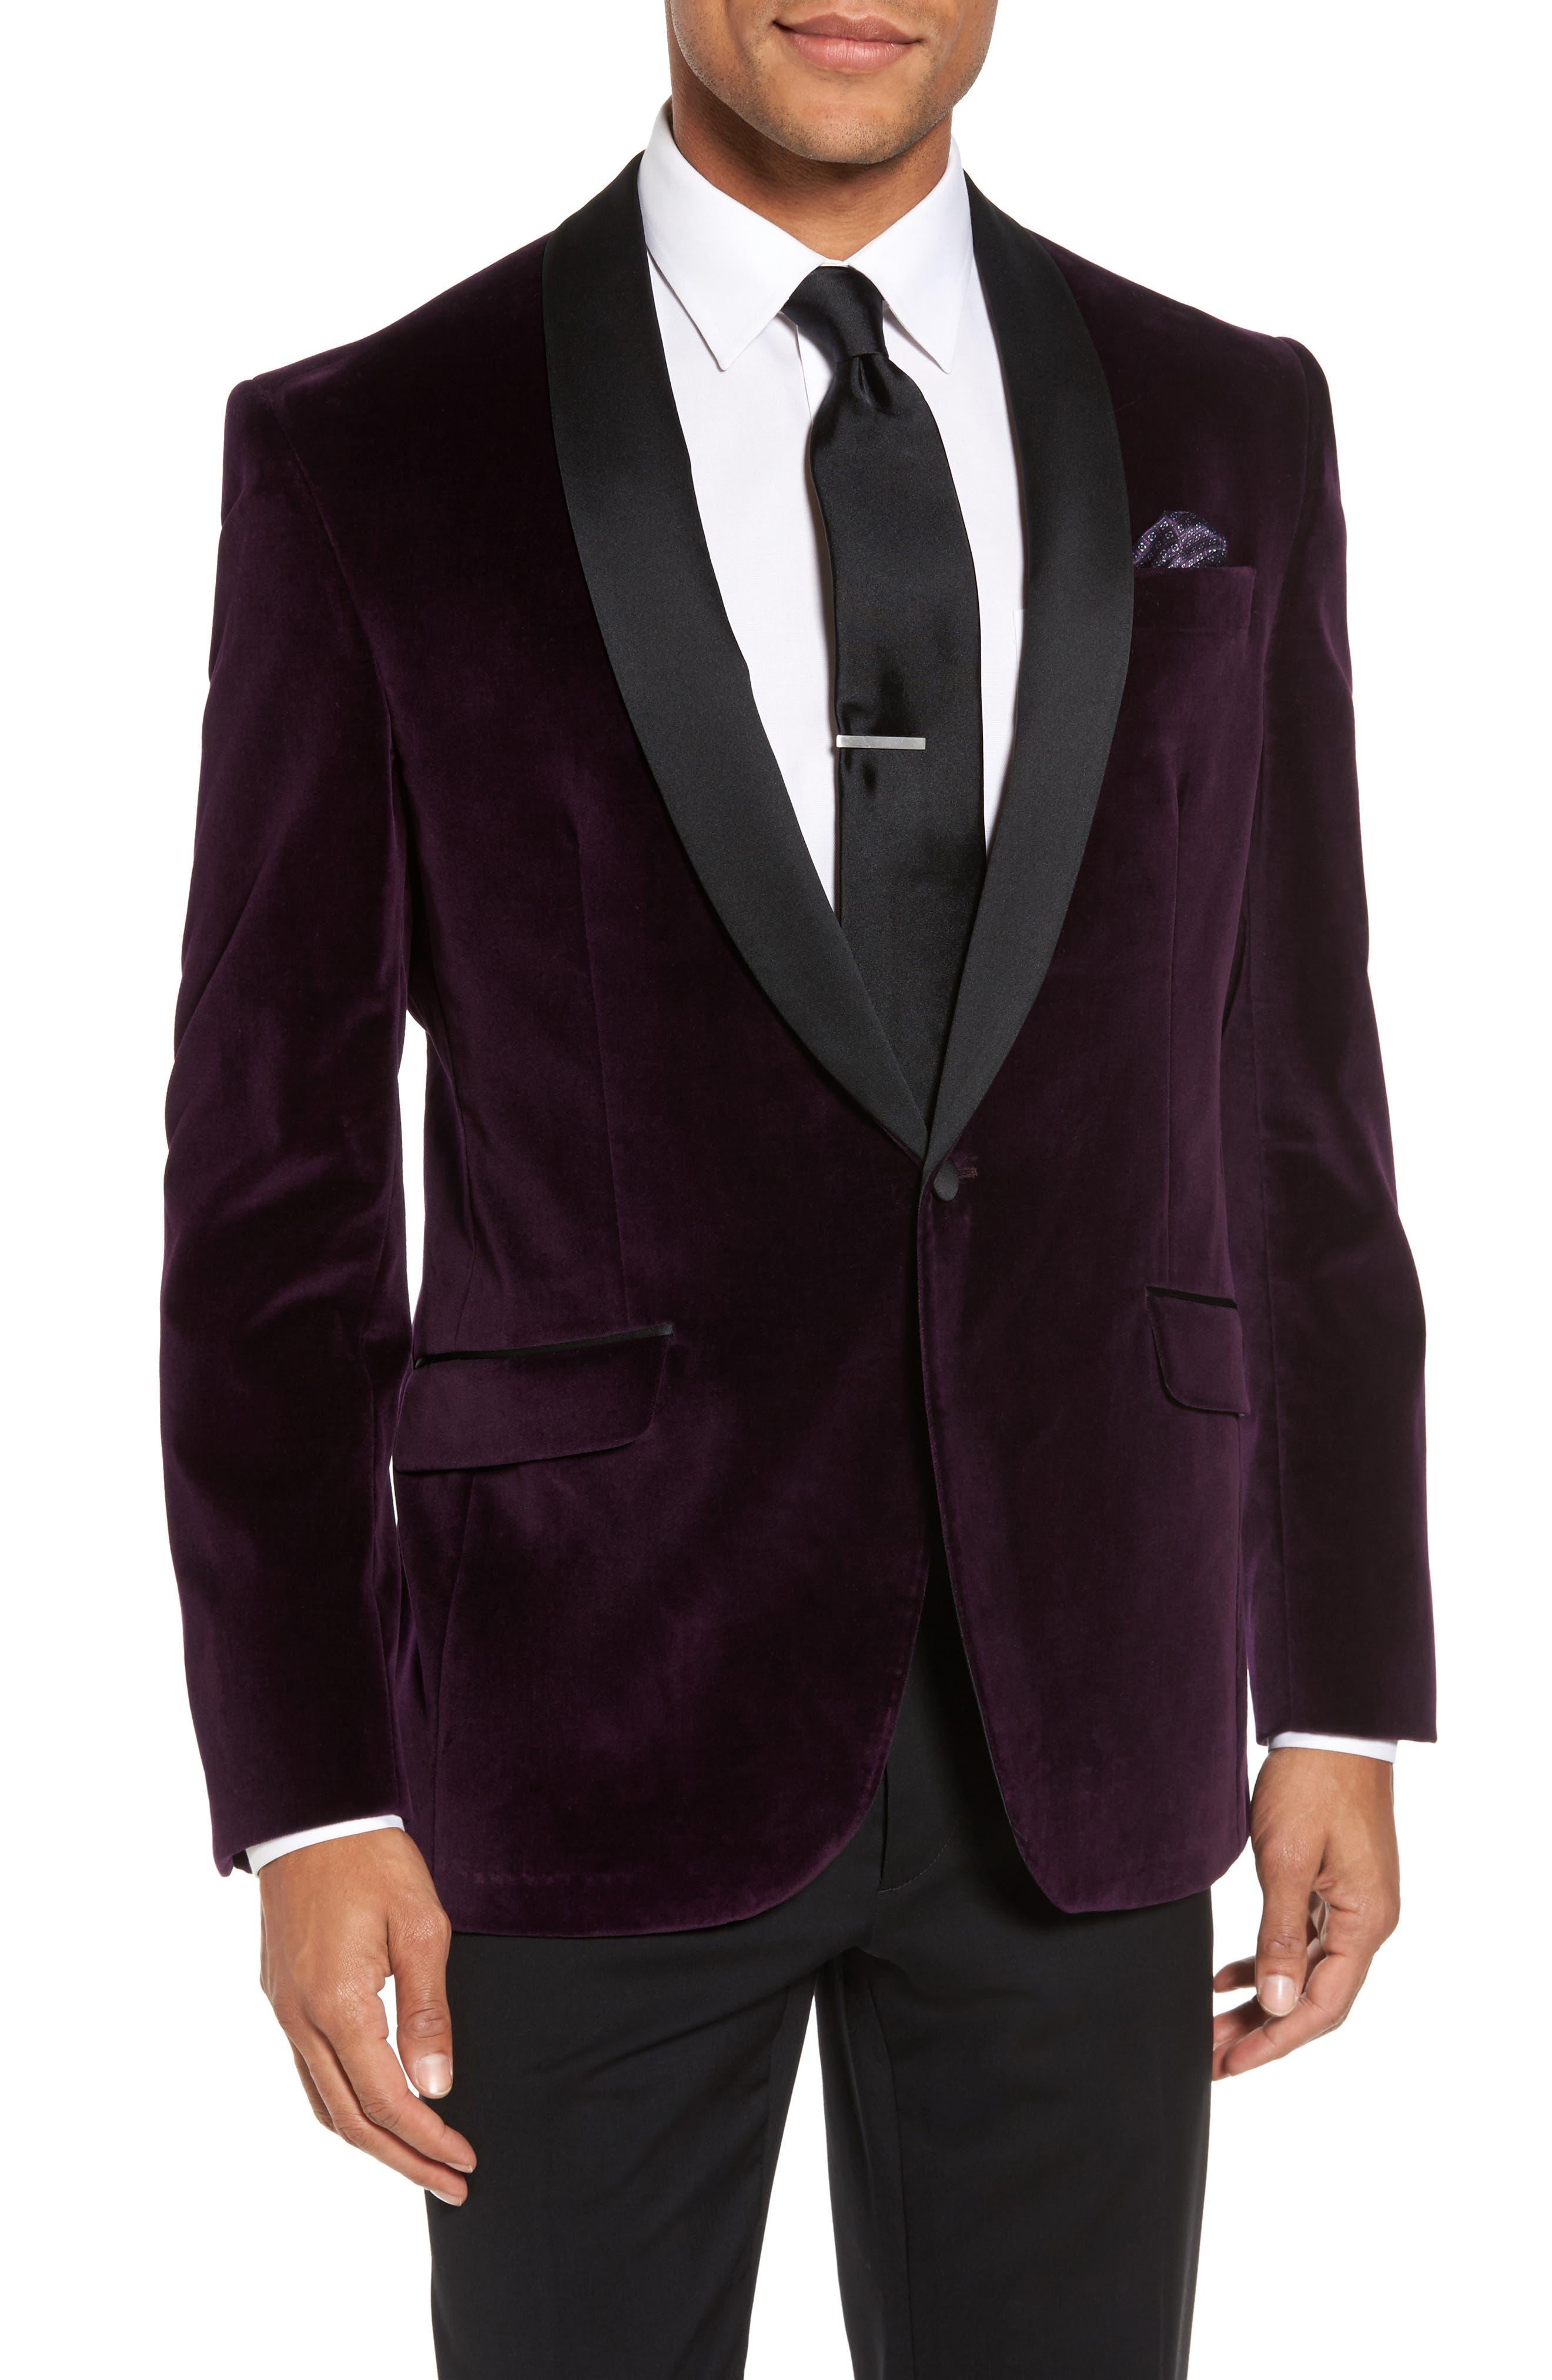 Josh Trim Fit Velvet Dinner Jacket,                         Main,                         color, PURPLE